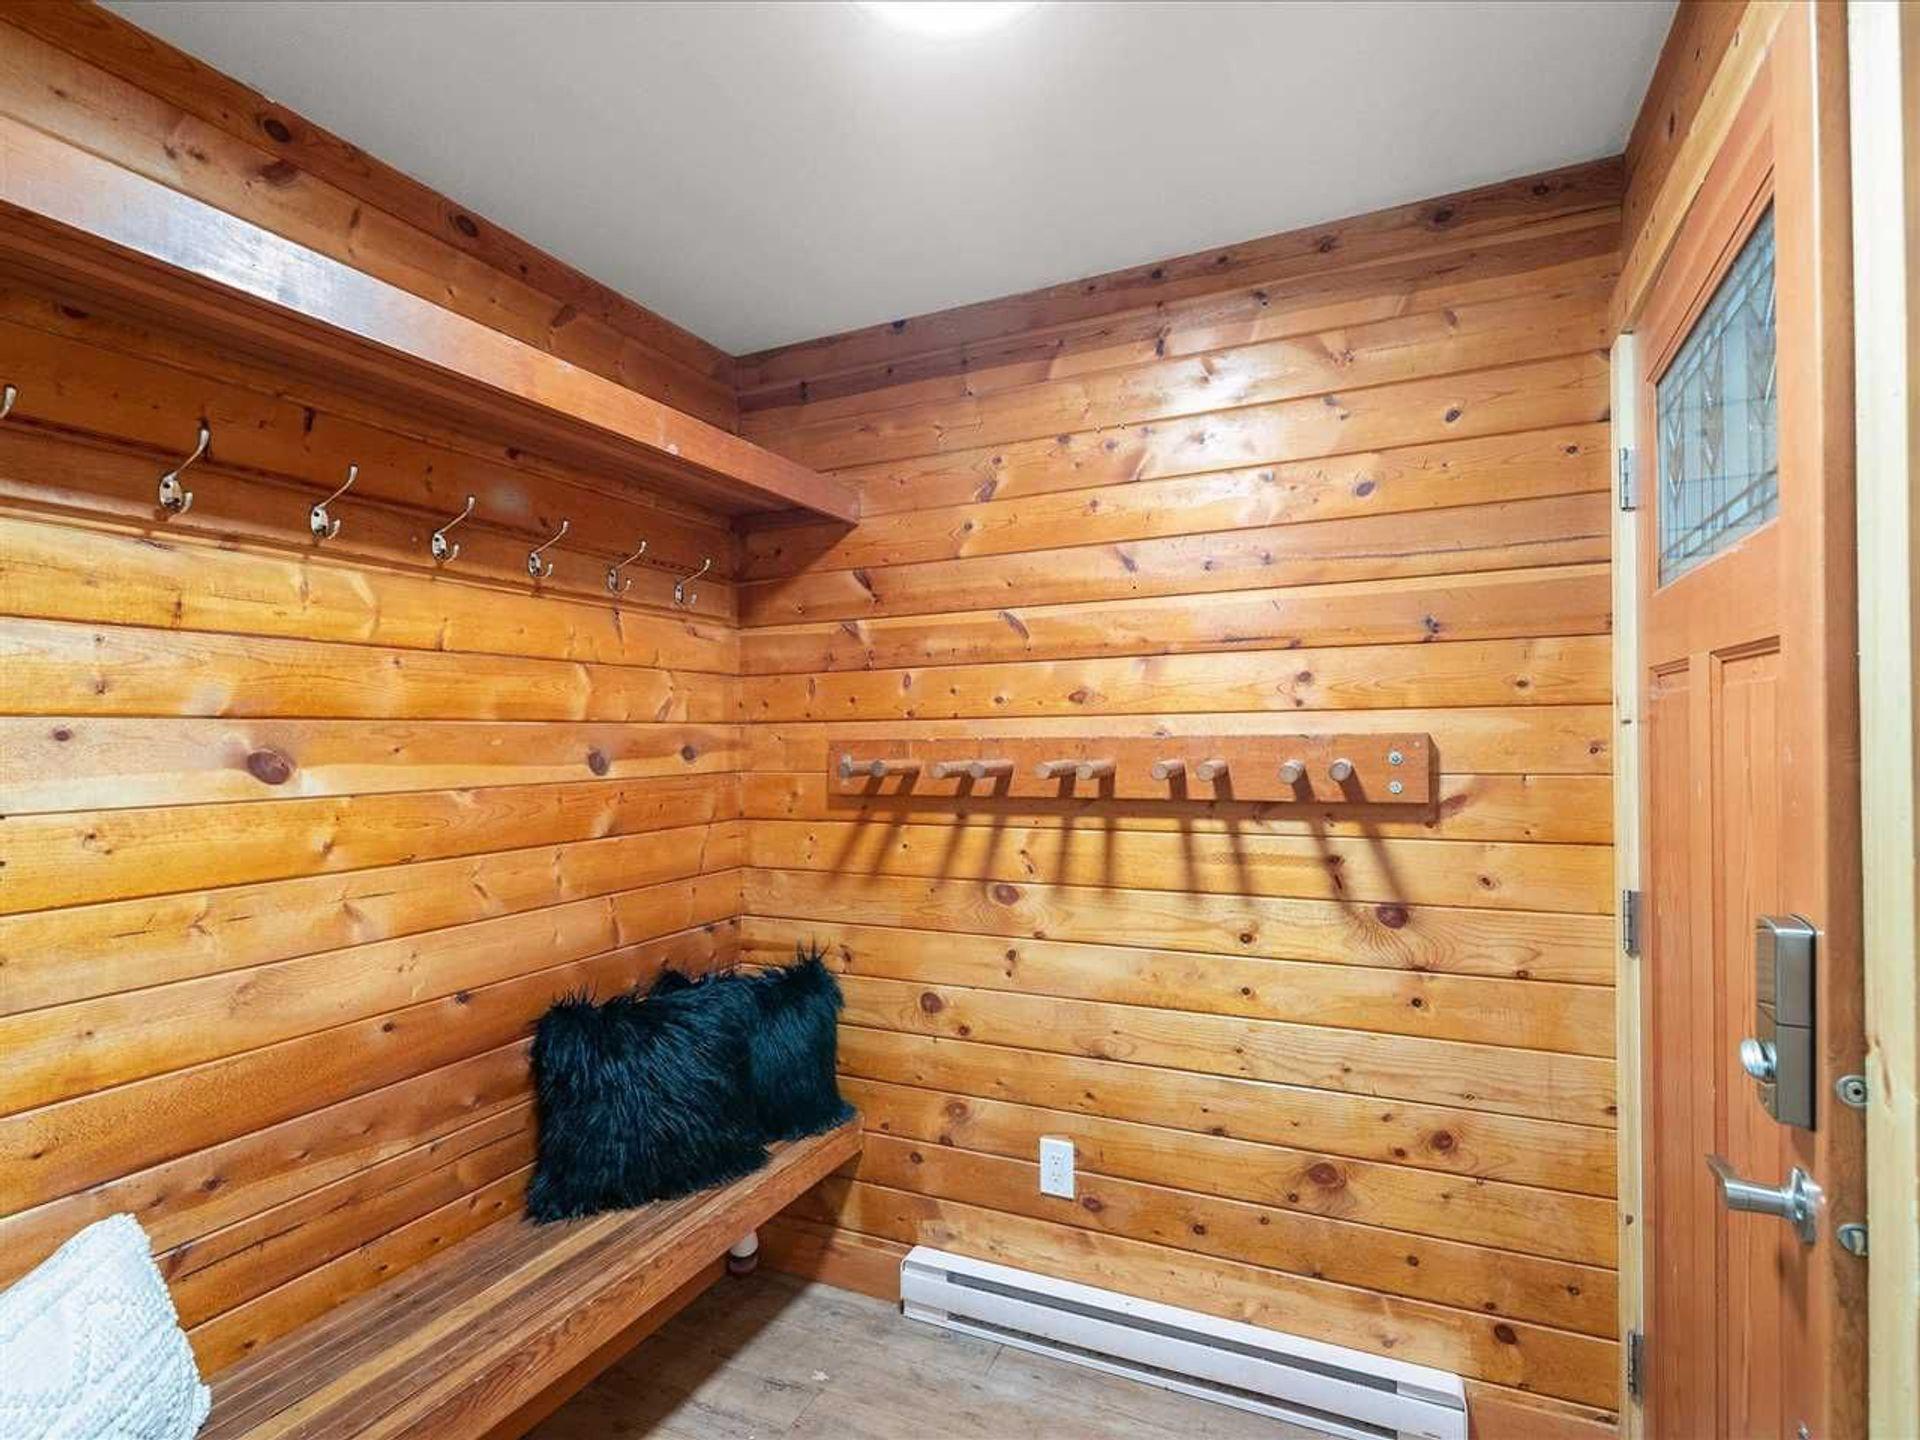 2222-brandywine-way-bayshores-whistler-22 at 72 - 2222 Brandywine Way, Bayshores, Whistler